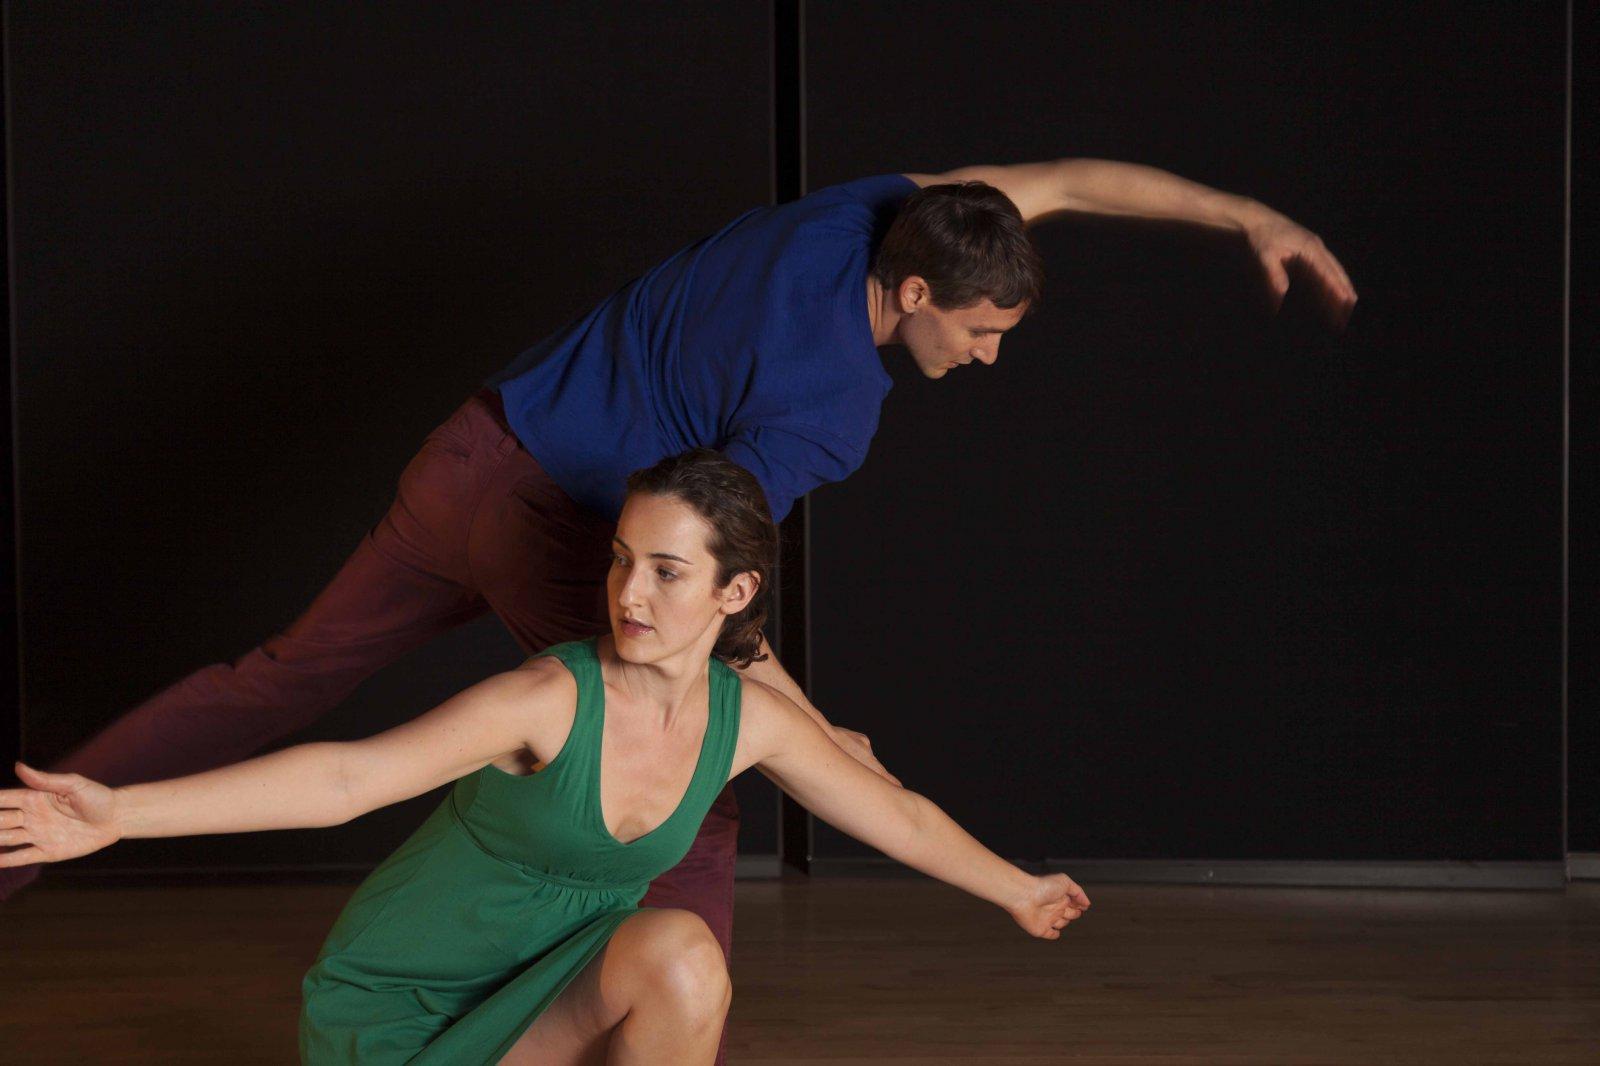 Monica Rodero and Daniel Schuchart. Photo by James Barsalou.